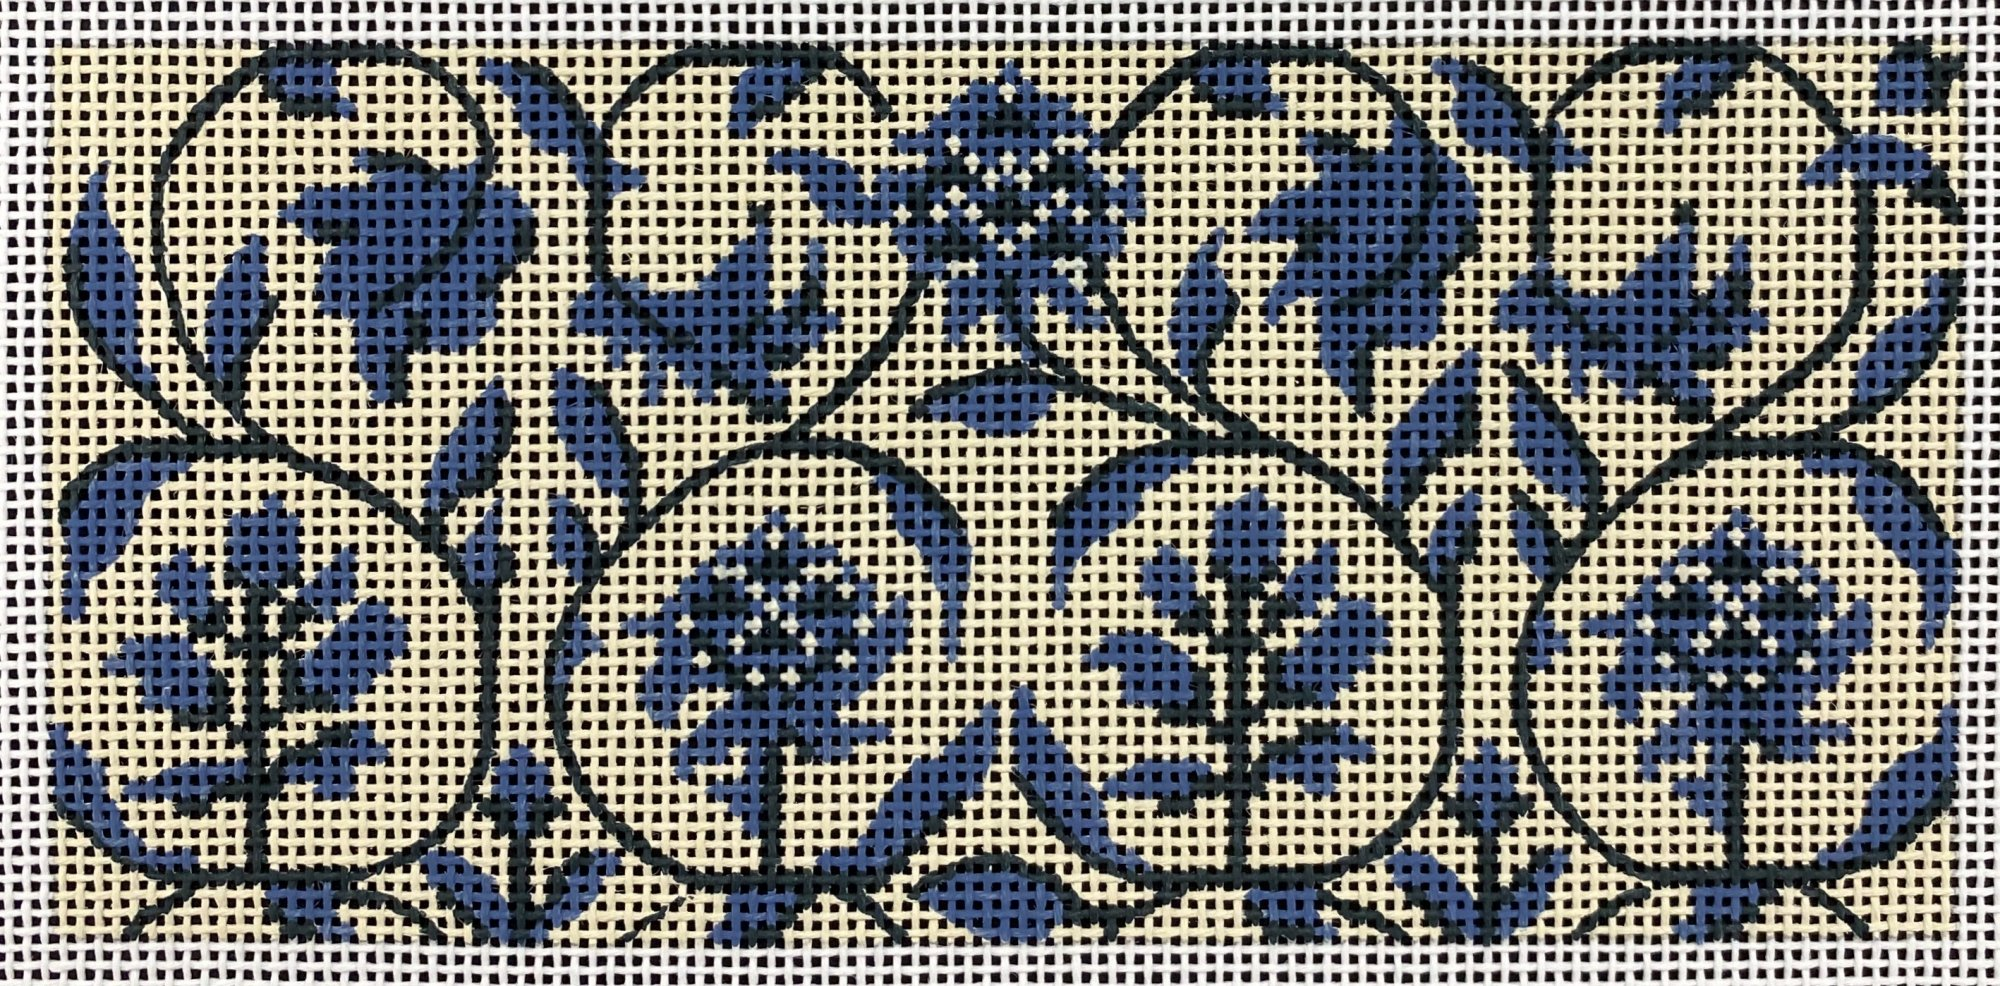 Blue Toile,18 ct.,2.75x6